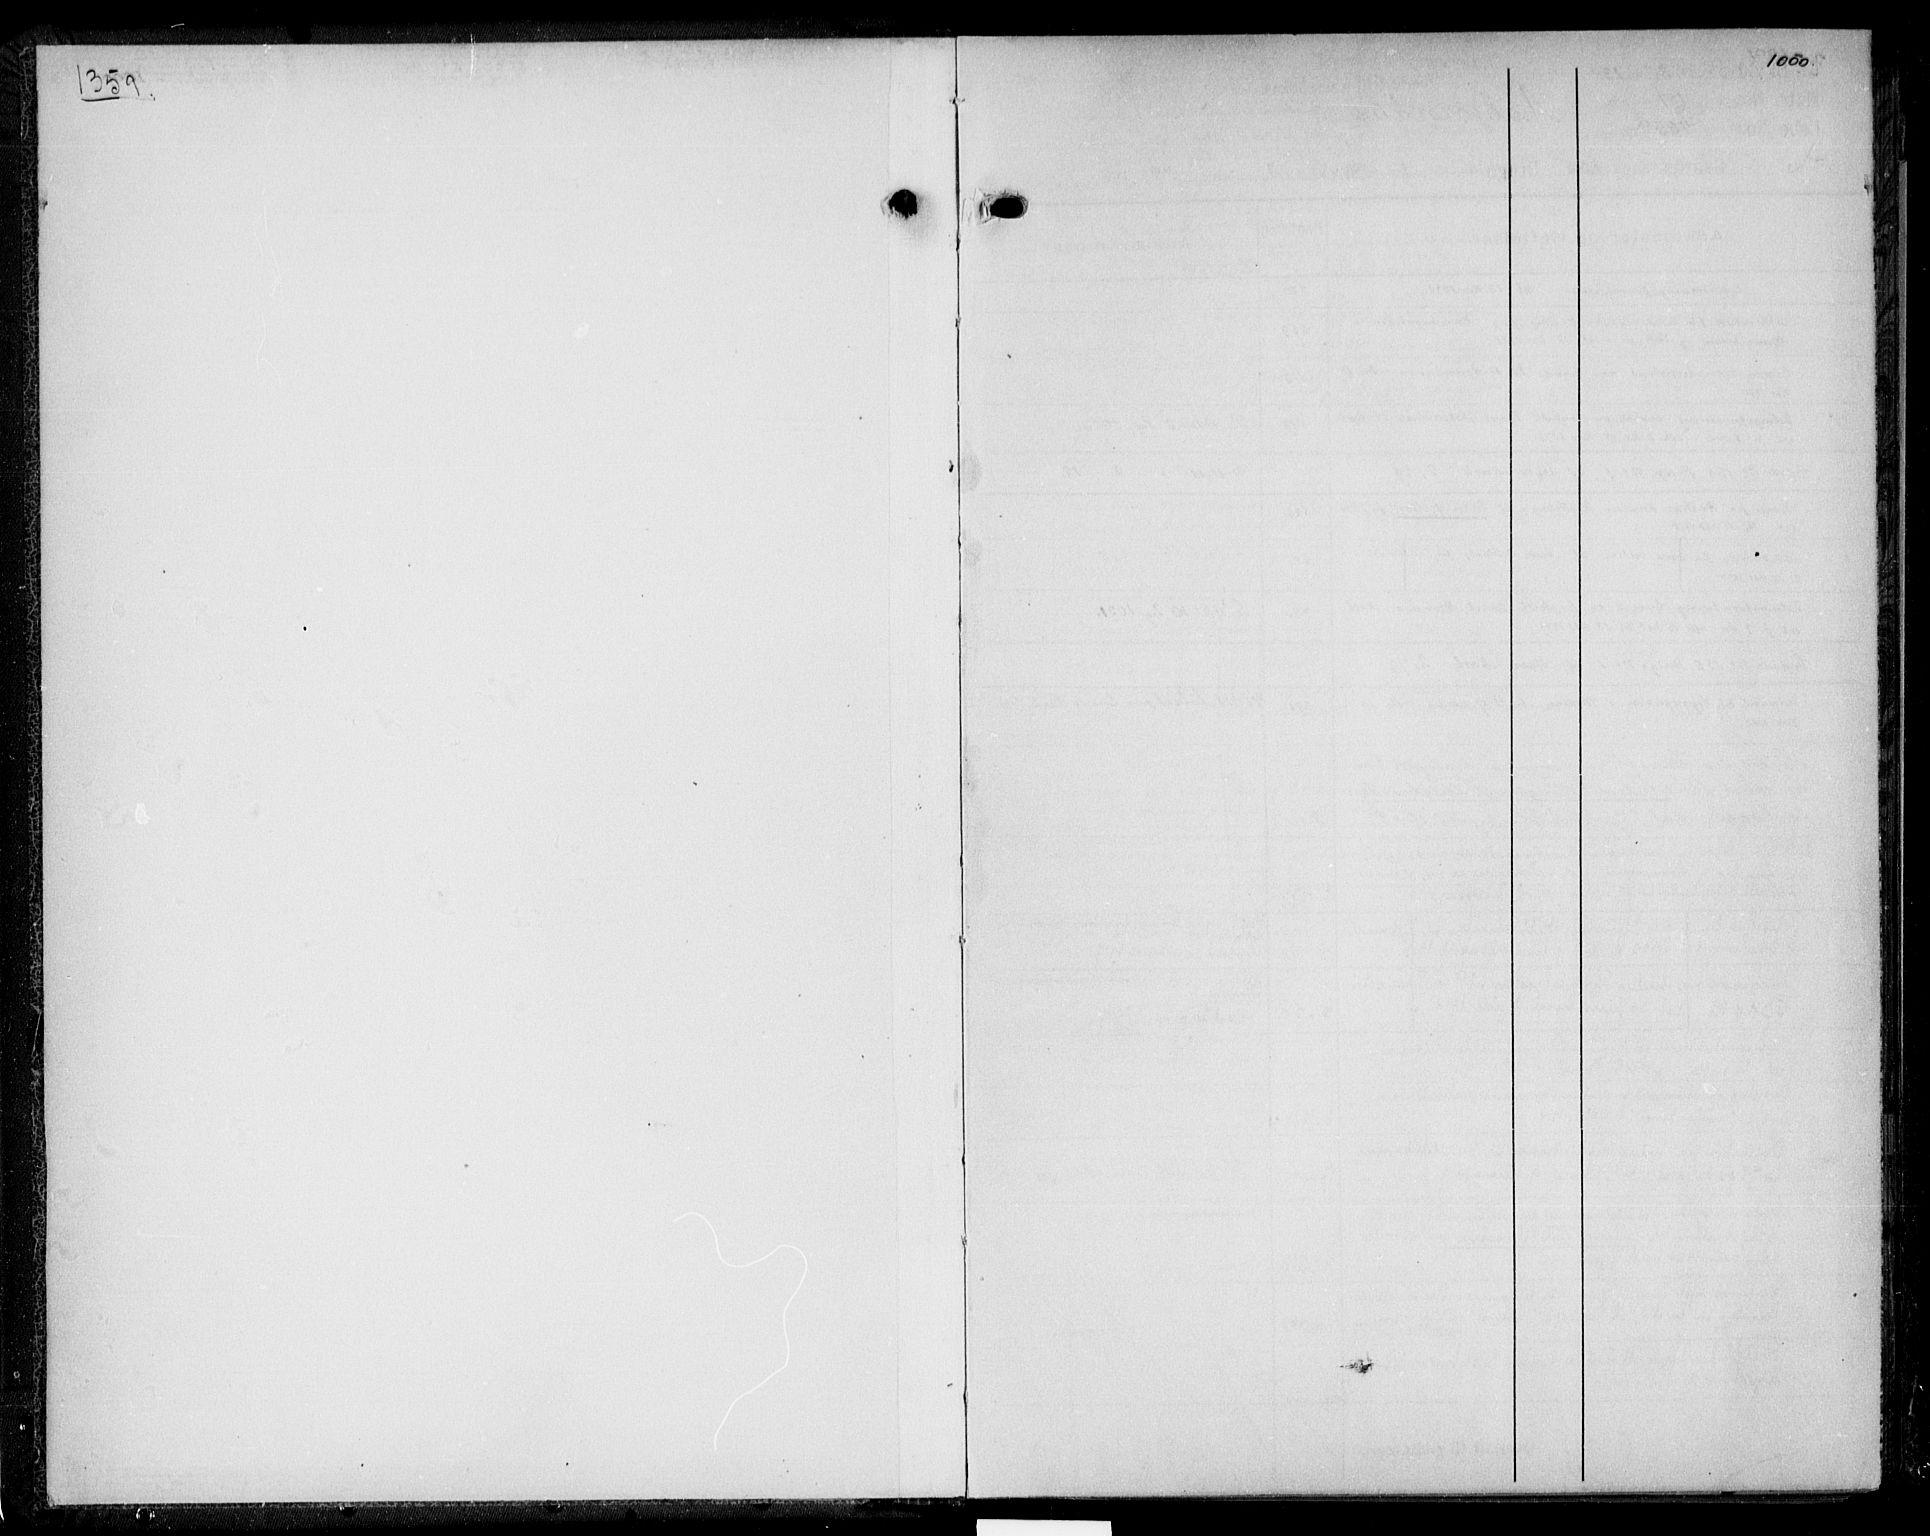 SAKO, Eiker, Modum og Sigdal sorenskriveri, G/Gb/Gbg/L0011: Panteregister nr. VII 11, s. 999-1000